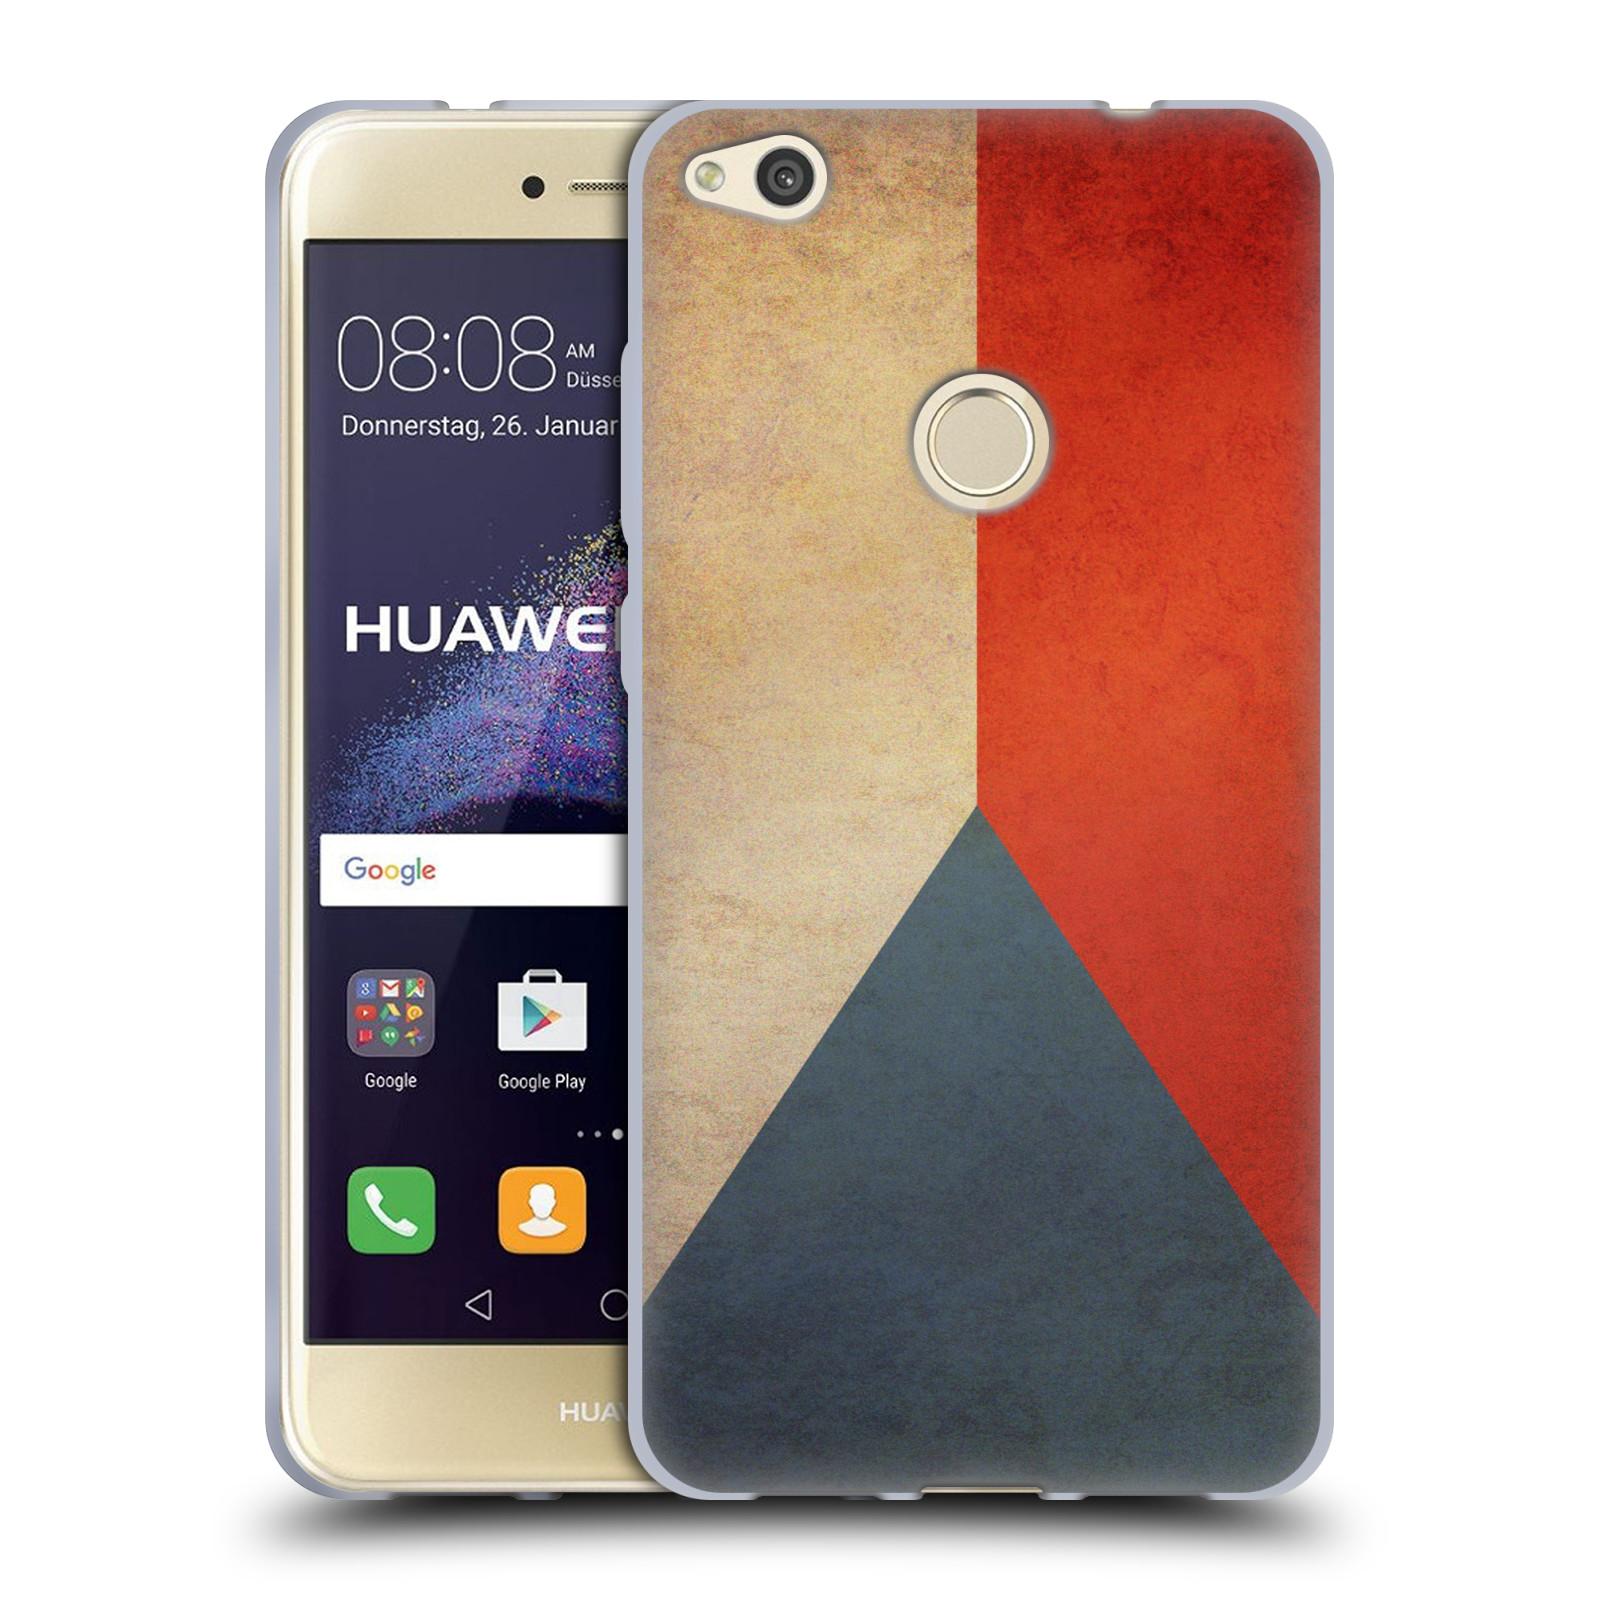 Silikonové pouzdro na mobil Huawei P9 Lite (2017) HEAD CASE VLAJKA ČESKÁ REPUBLIKA